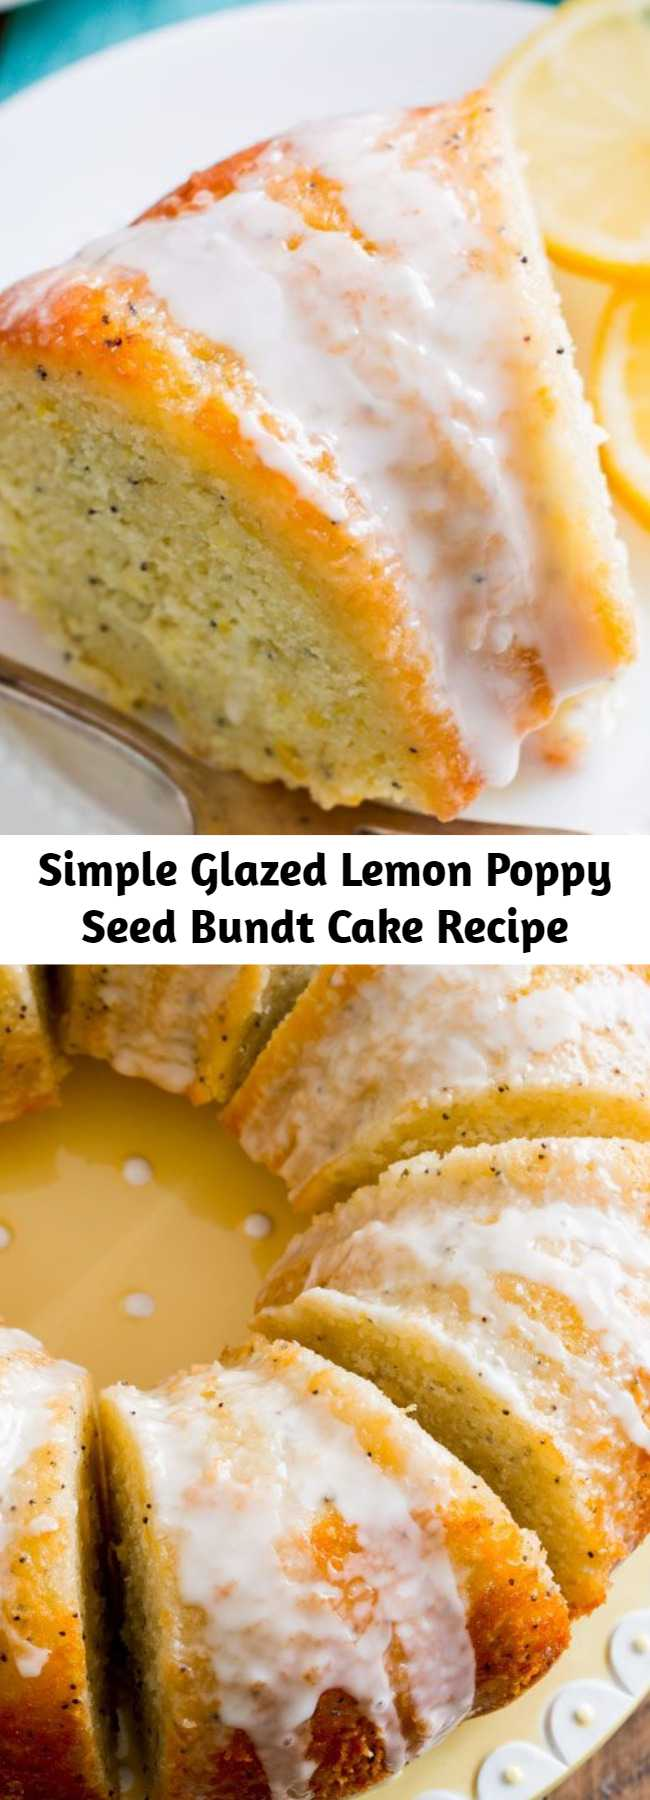 Simple Glazed Lemon Poppy Seed Bundt Cake Recipe - Sweet, simple, luscious glazed lemon poppy seed bundt cake to bring sunshine to even the coldest of days.